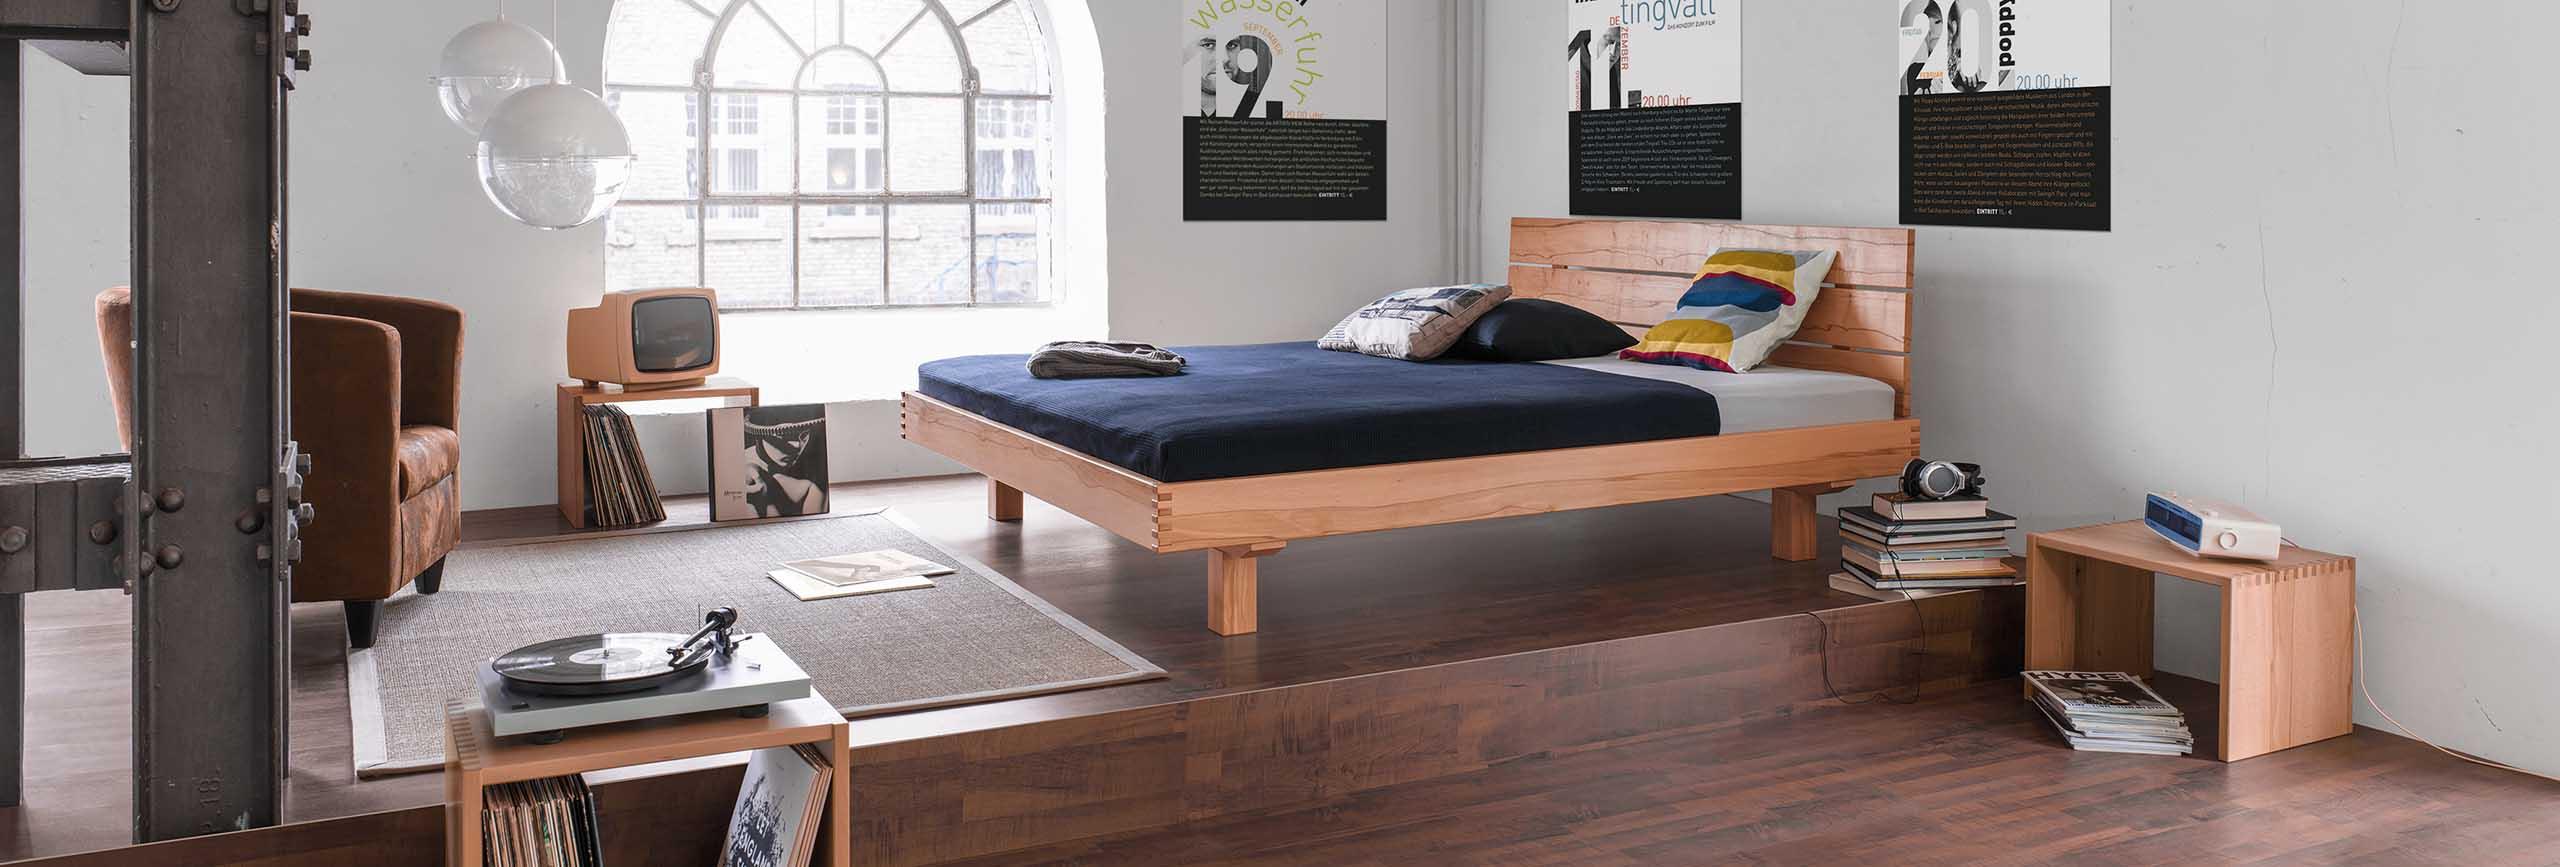 betten aus massivholz in frankfurt dormivital frankfurt. Black Bedroom Furniture Sets. Home Design Ideas